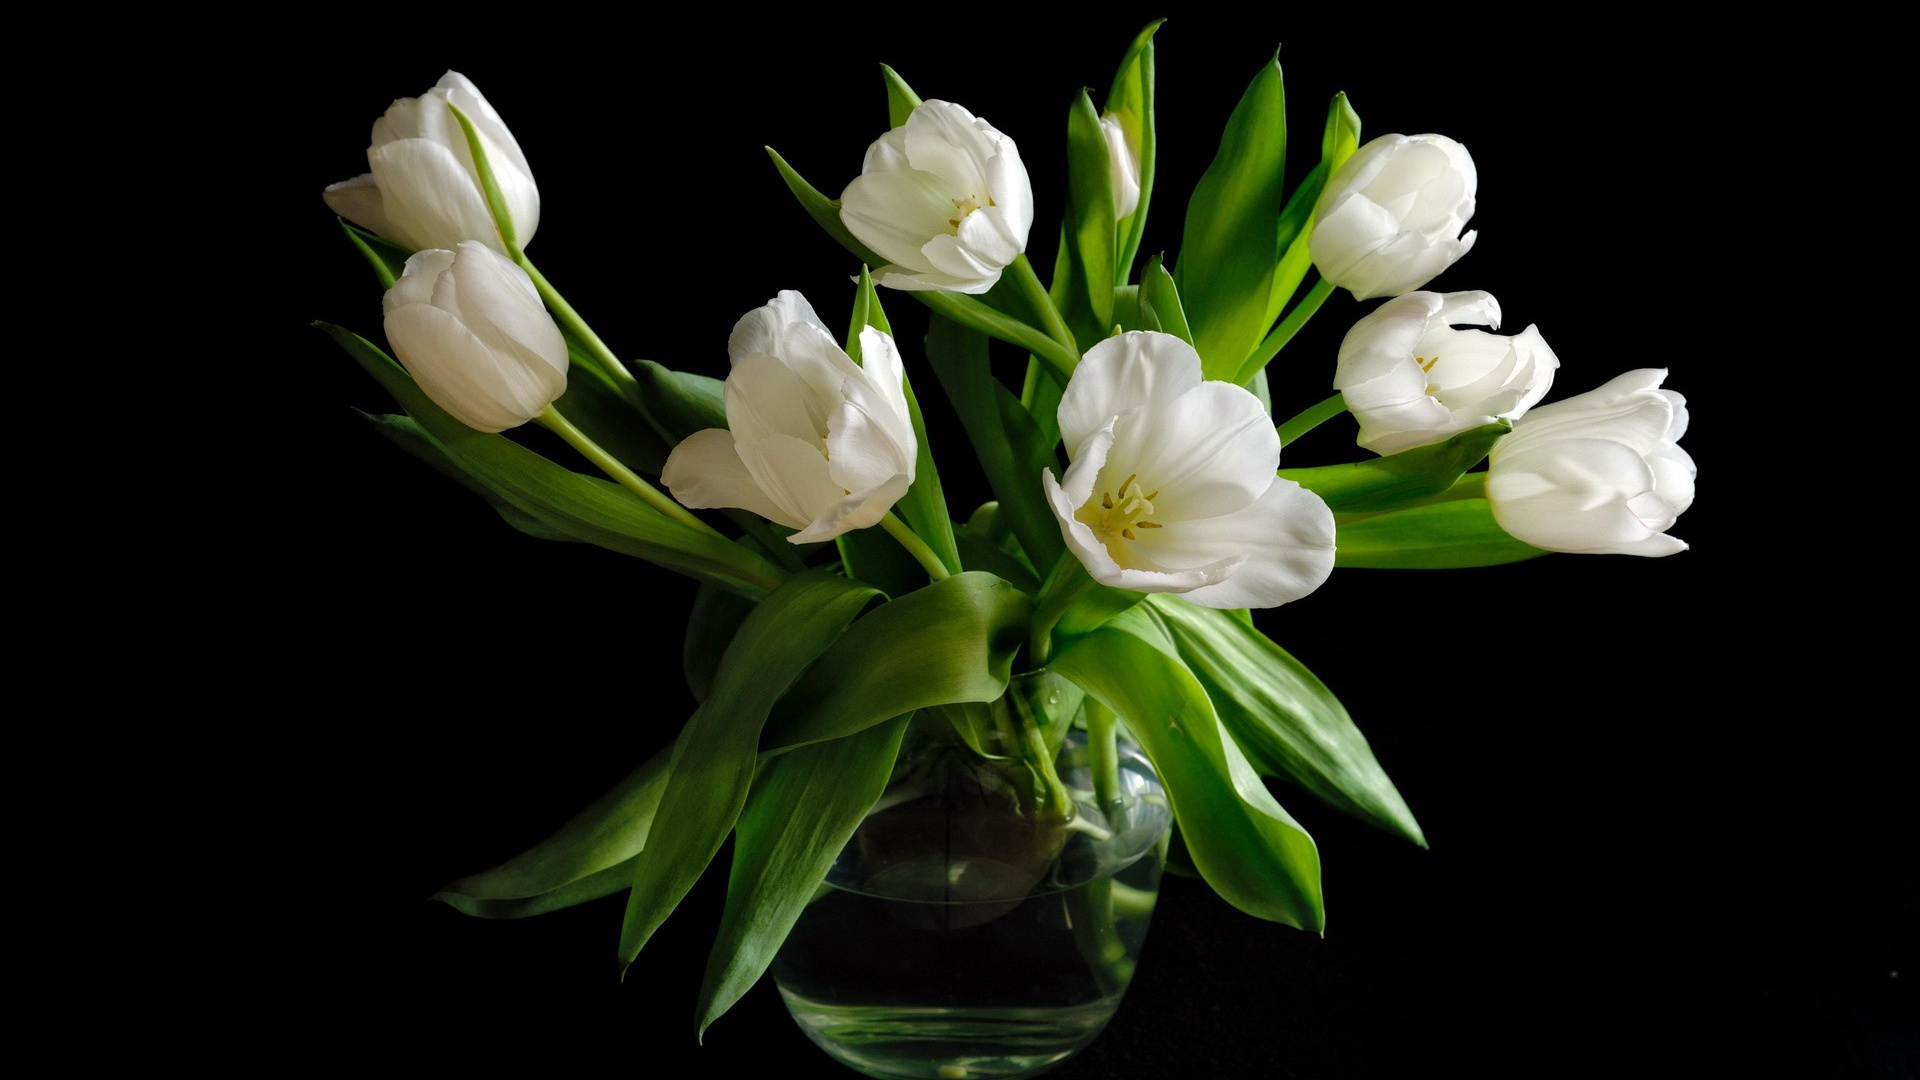 white flower wallpaper 1920x1080 - photo #46